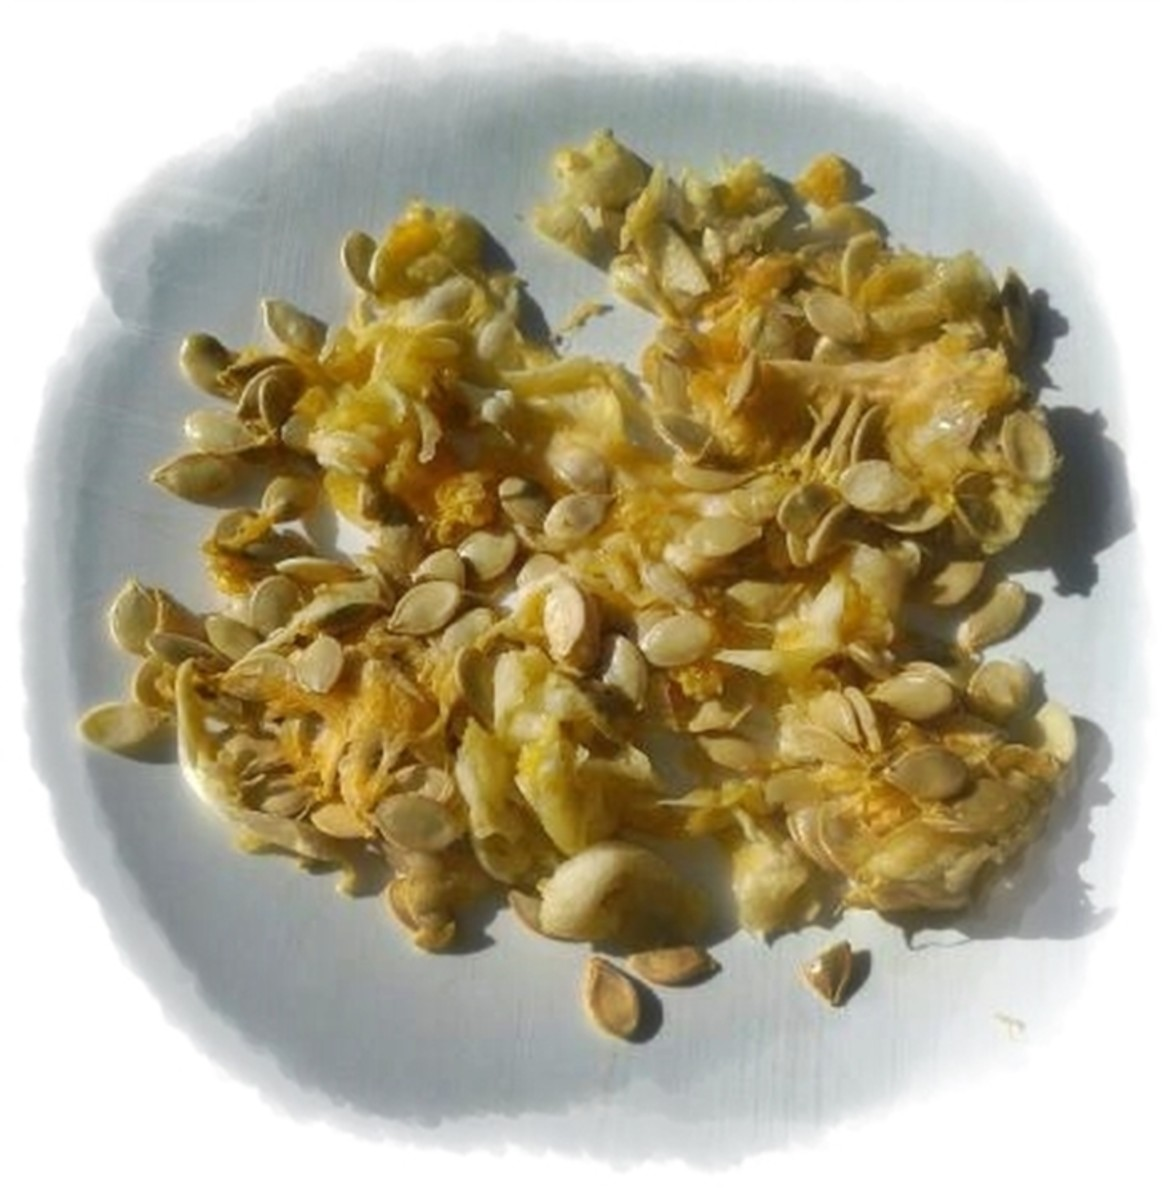 Pumpkin Seed Roasting